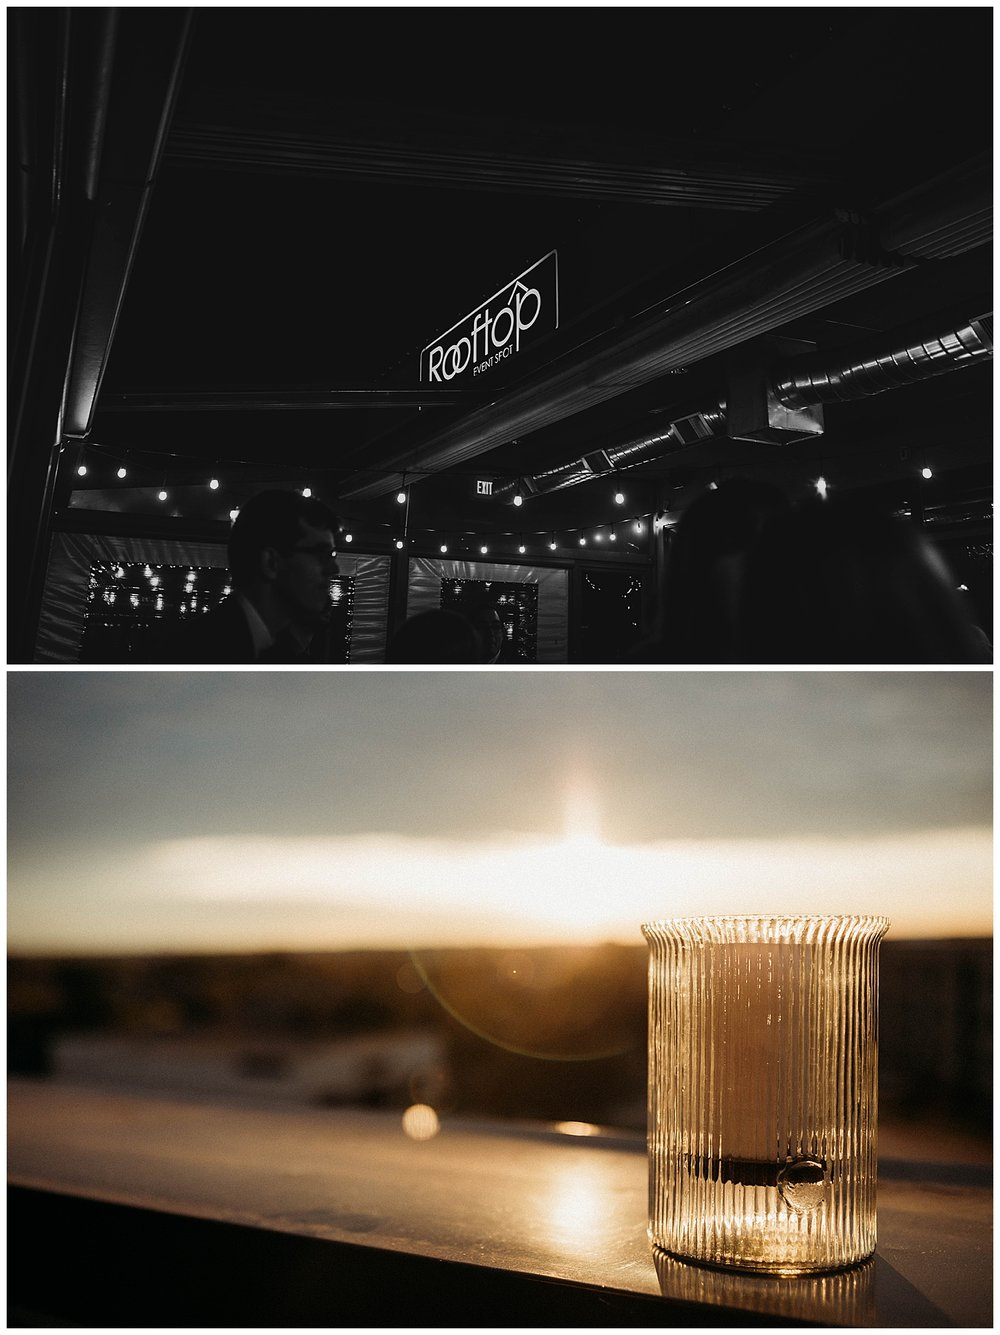 BrittanyGilbertPhotography_Wedding_RooftopEventCenter2.jpg